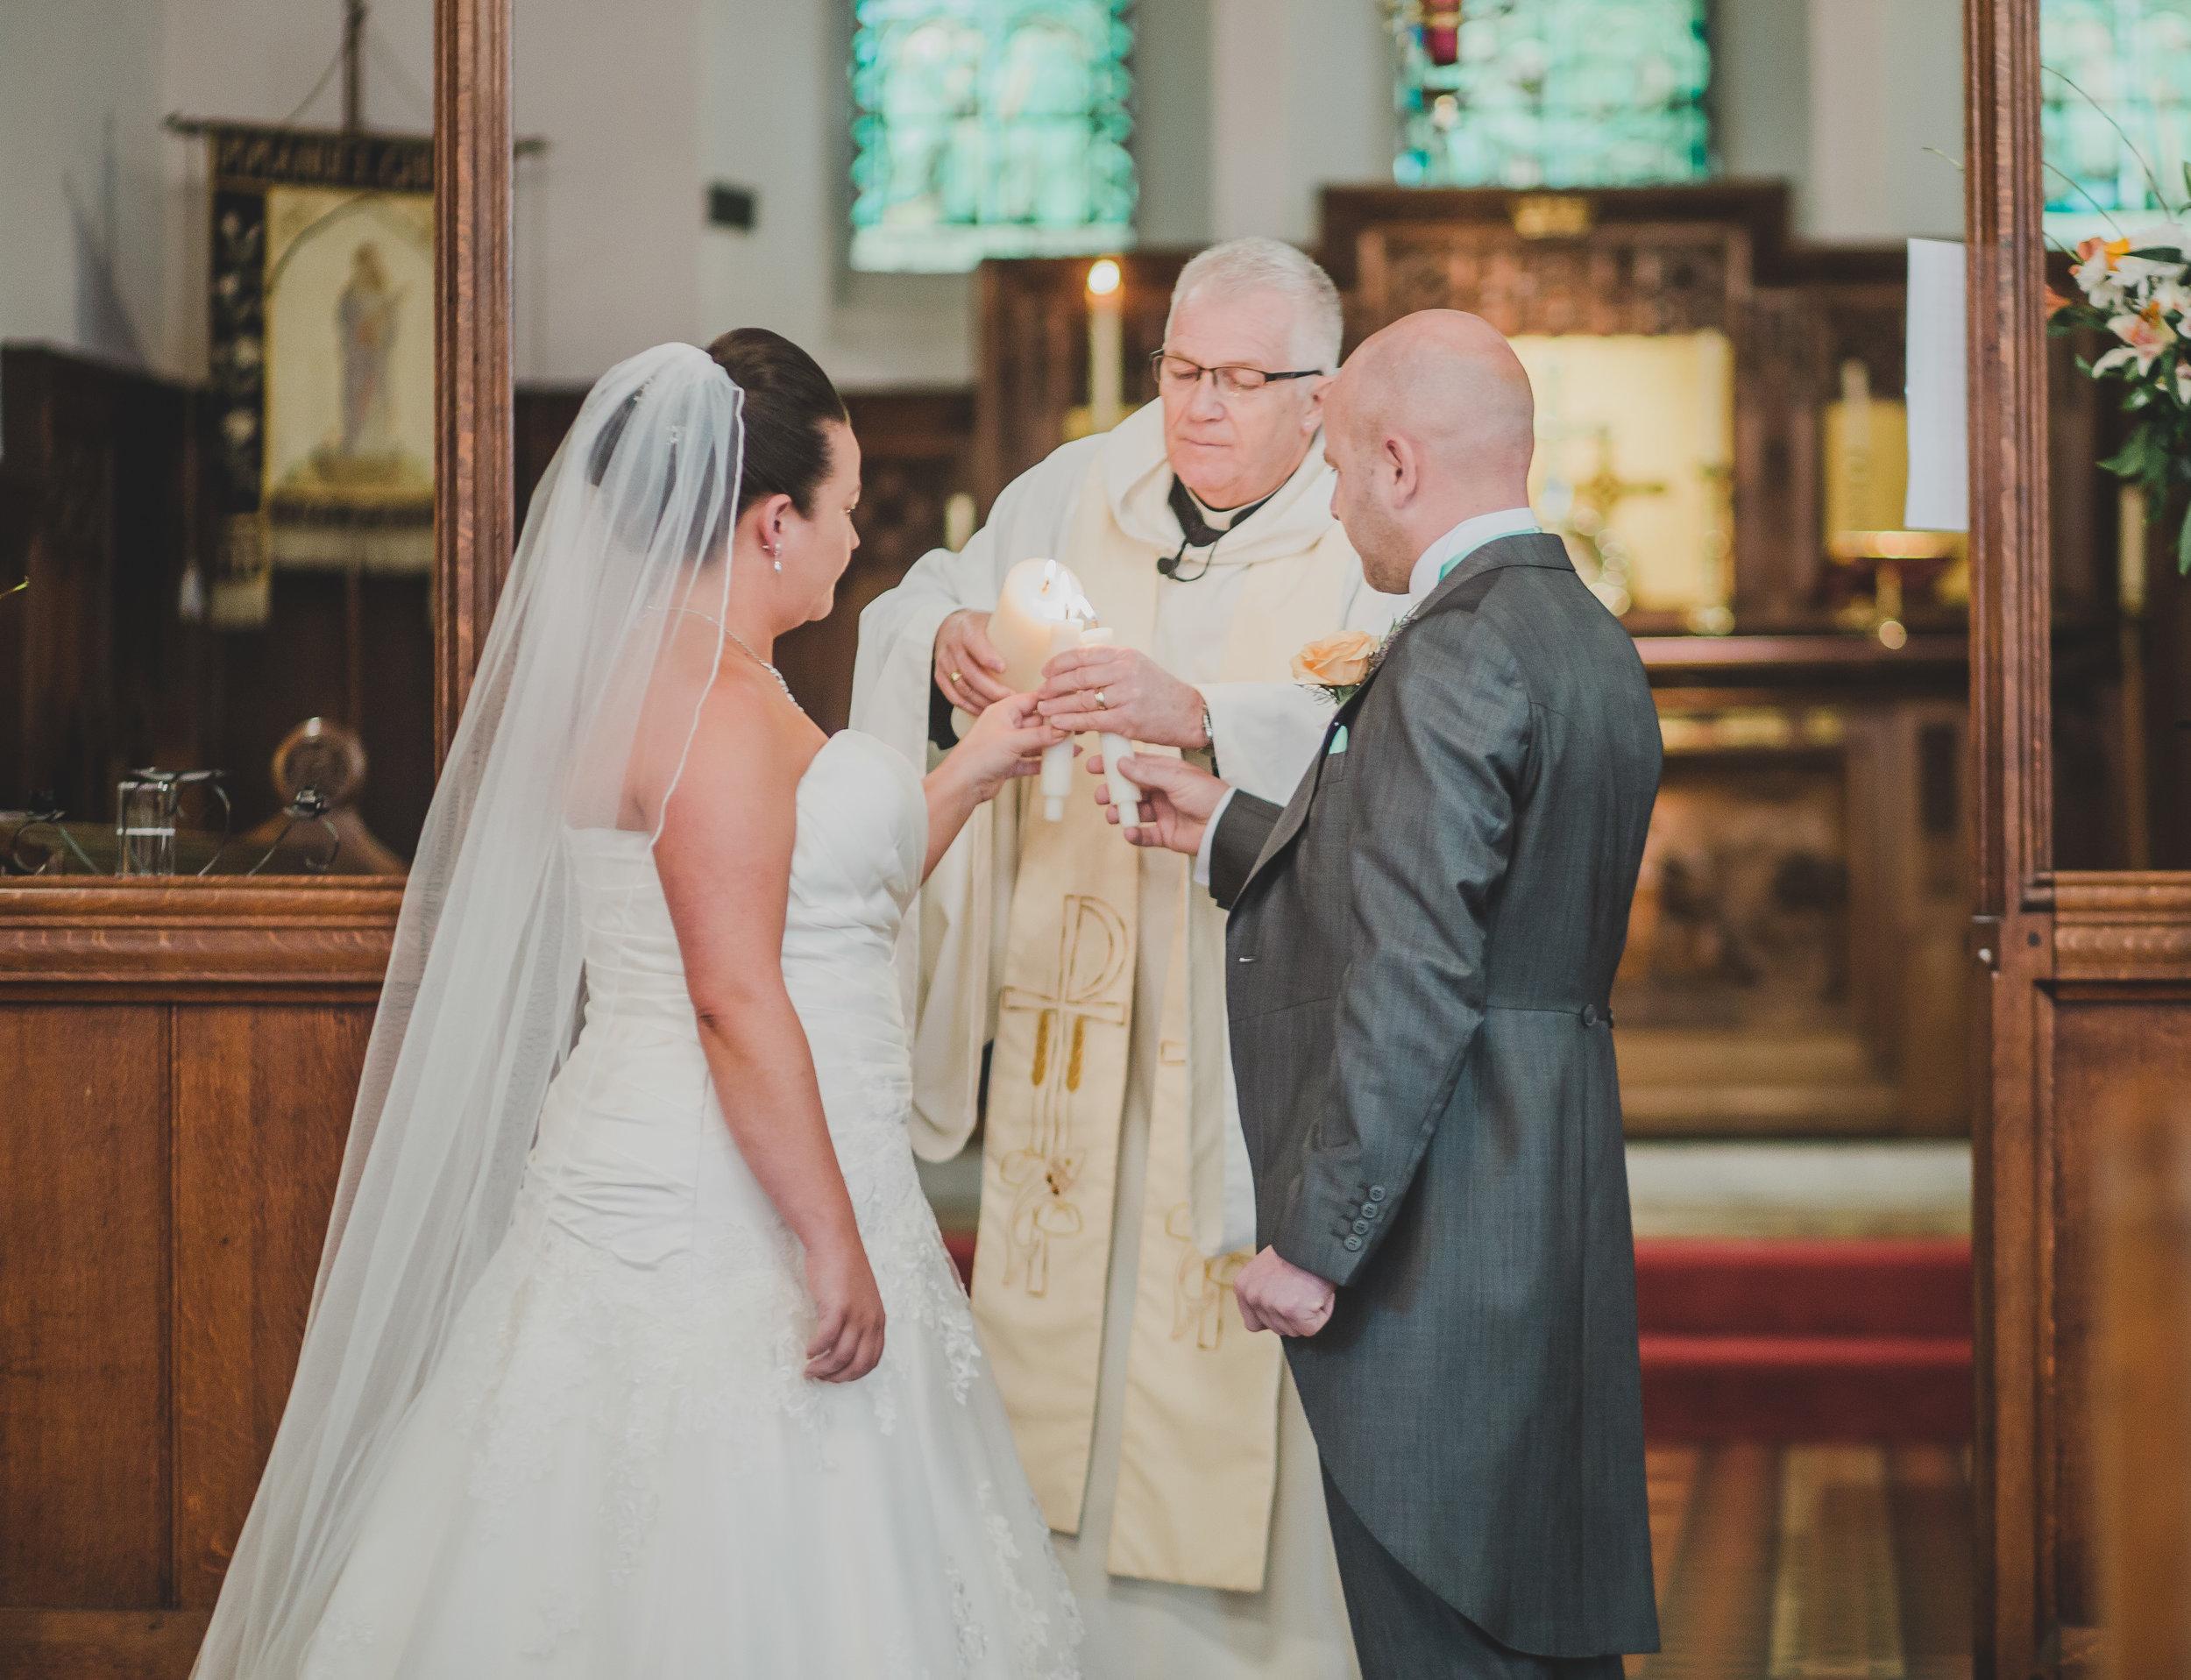 wedding ceremony in Accrington